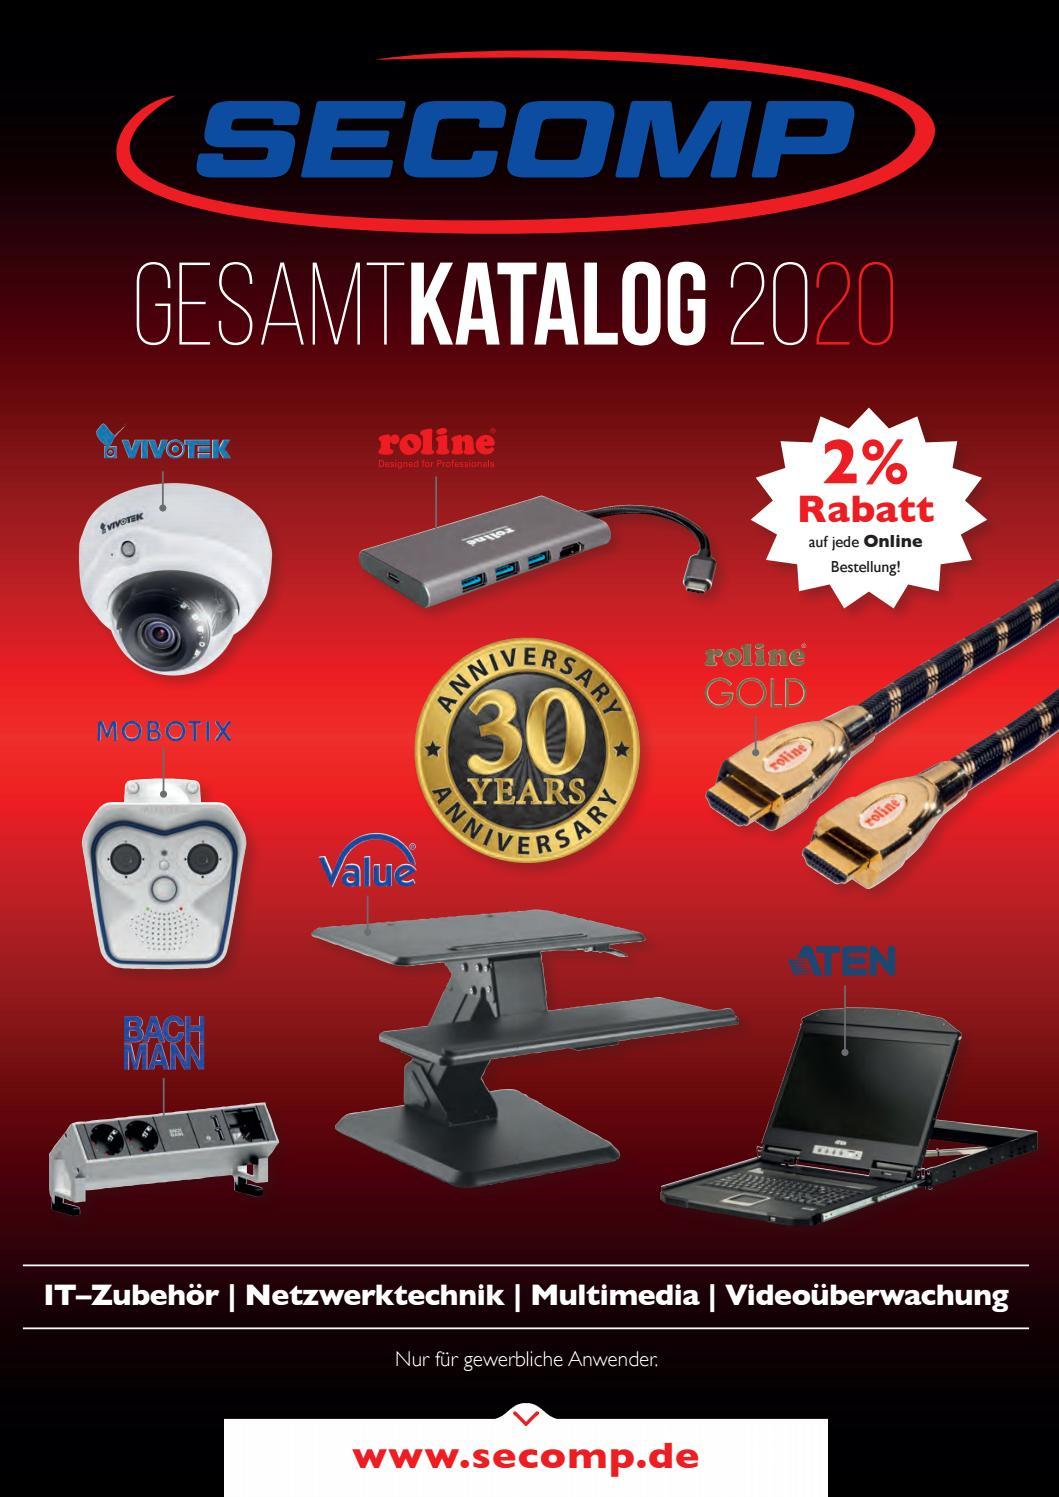 Neu 6A 250V Taste Kontrolle Inline-Kabel Schalter Wippschalter Kunststoff 3 typ